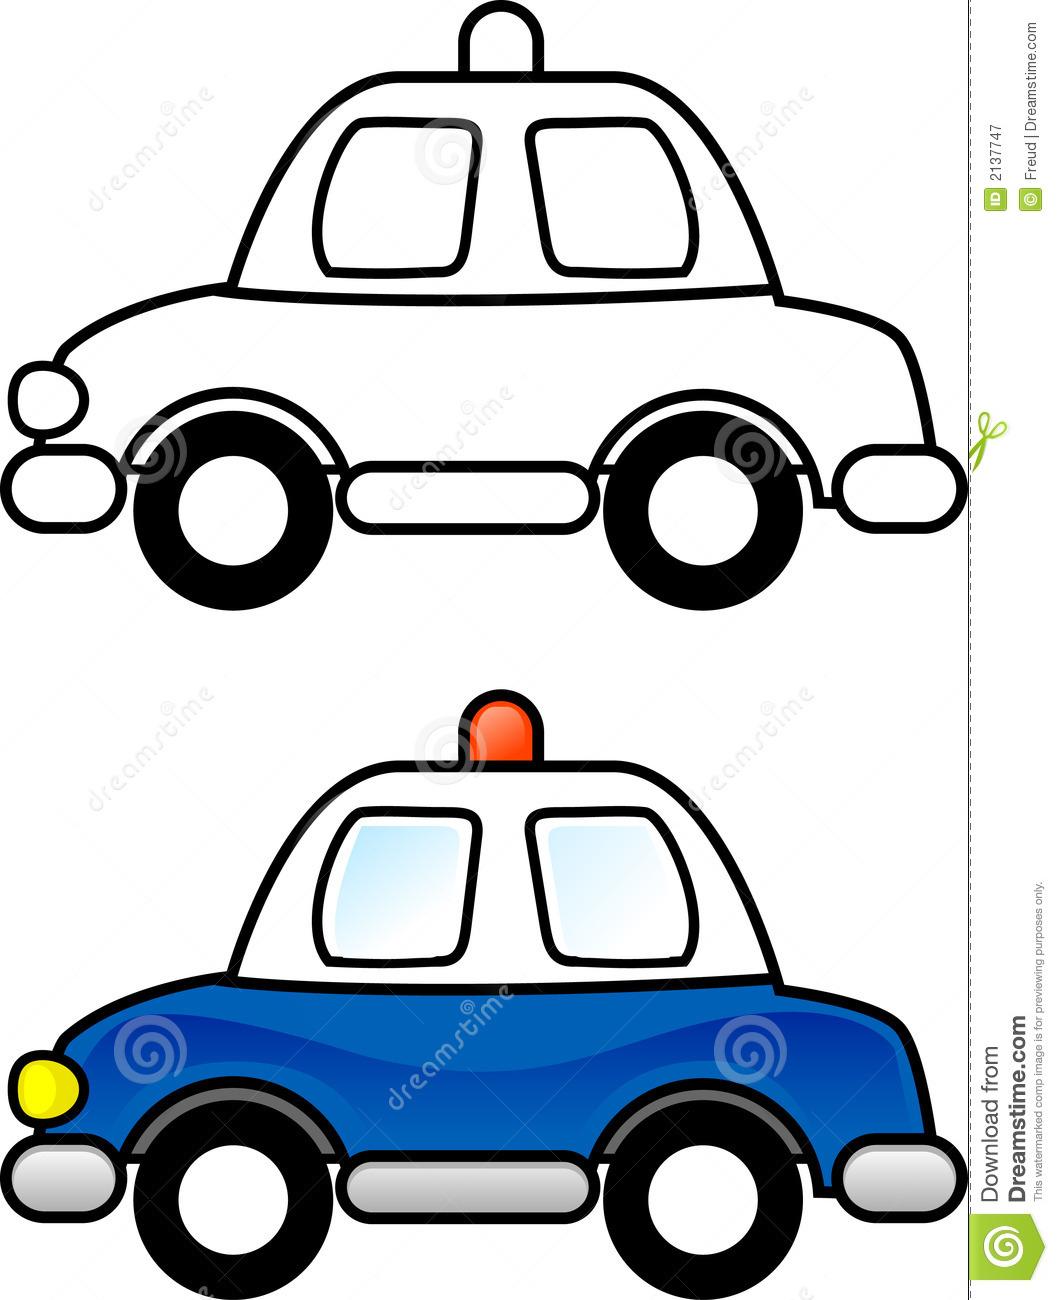 1058x1300 Clipart Police Car Outline